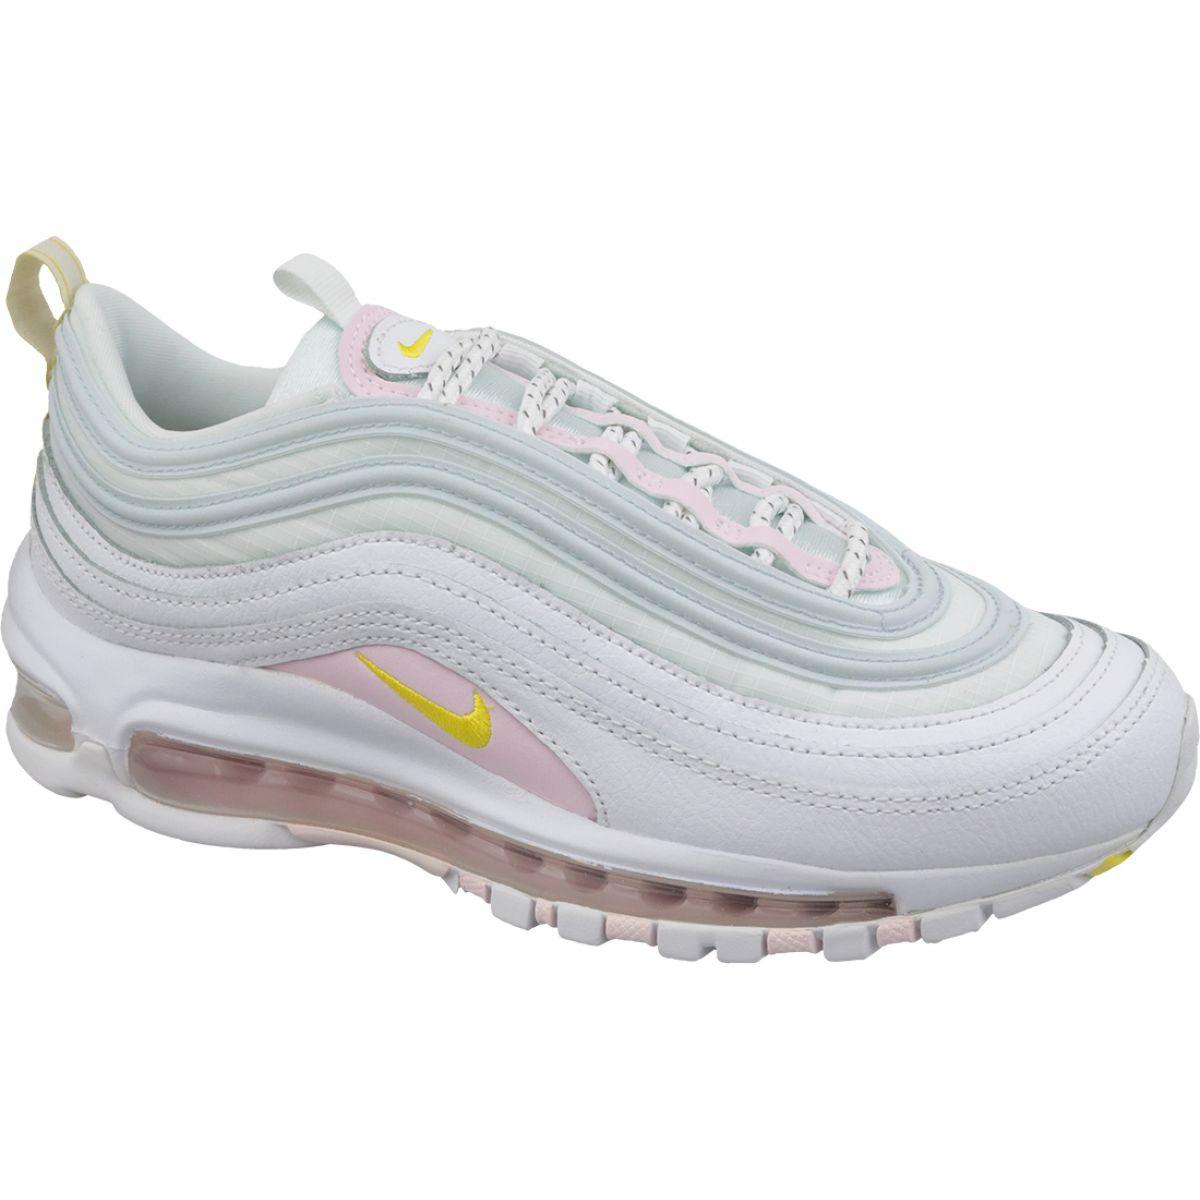 Sapatos Nike Air Max 97 Se CI9089 100 branco